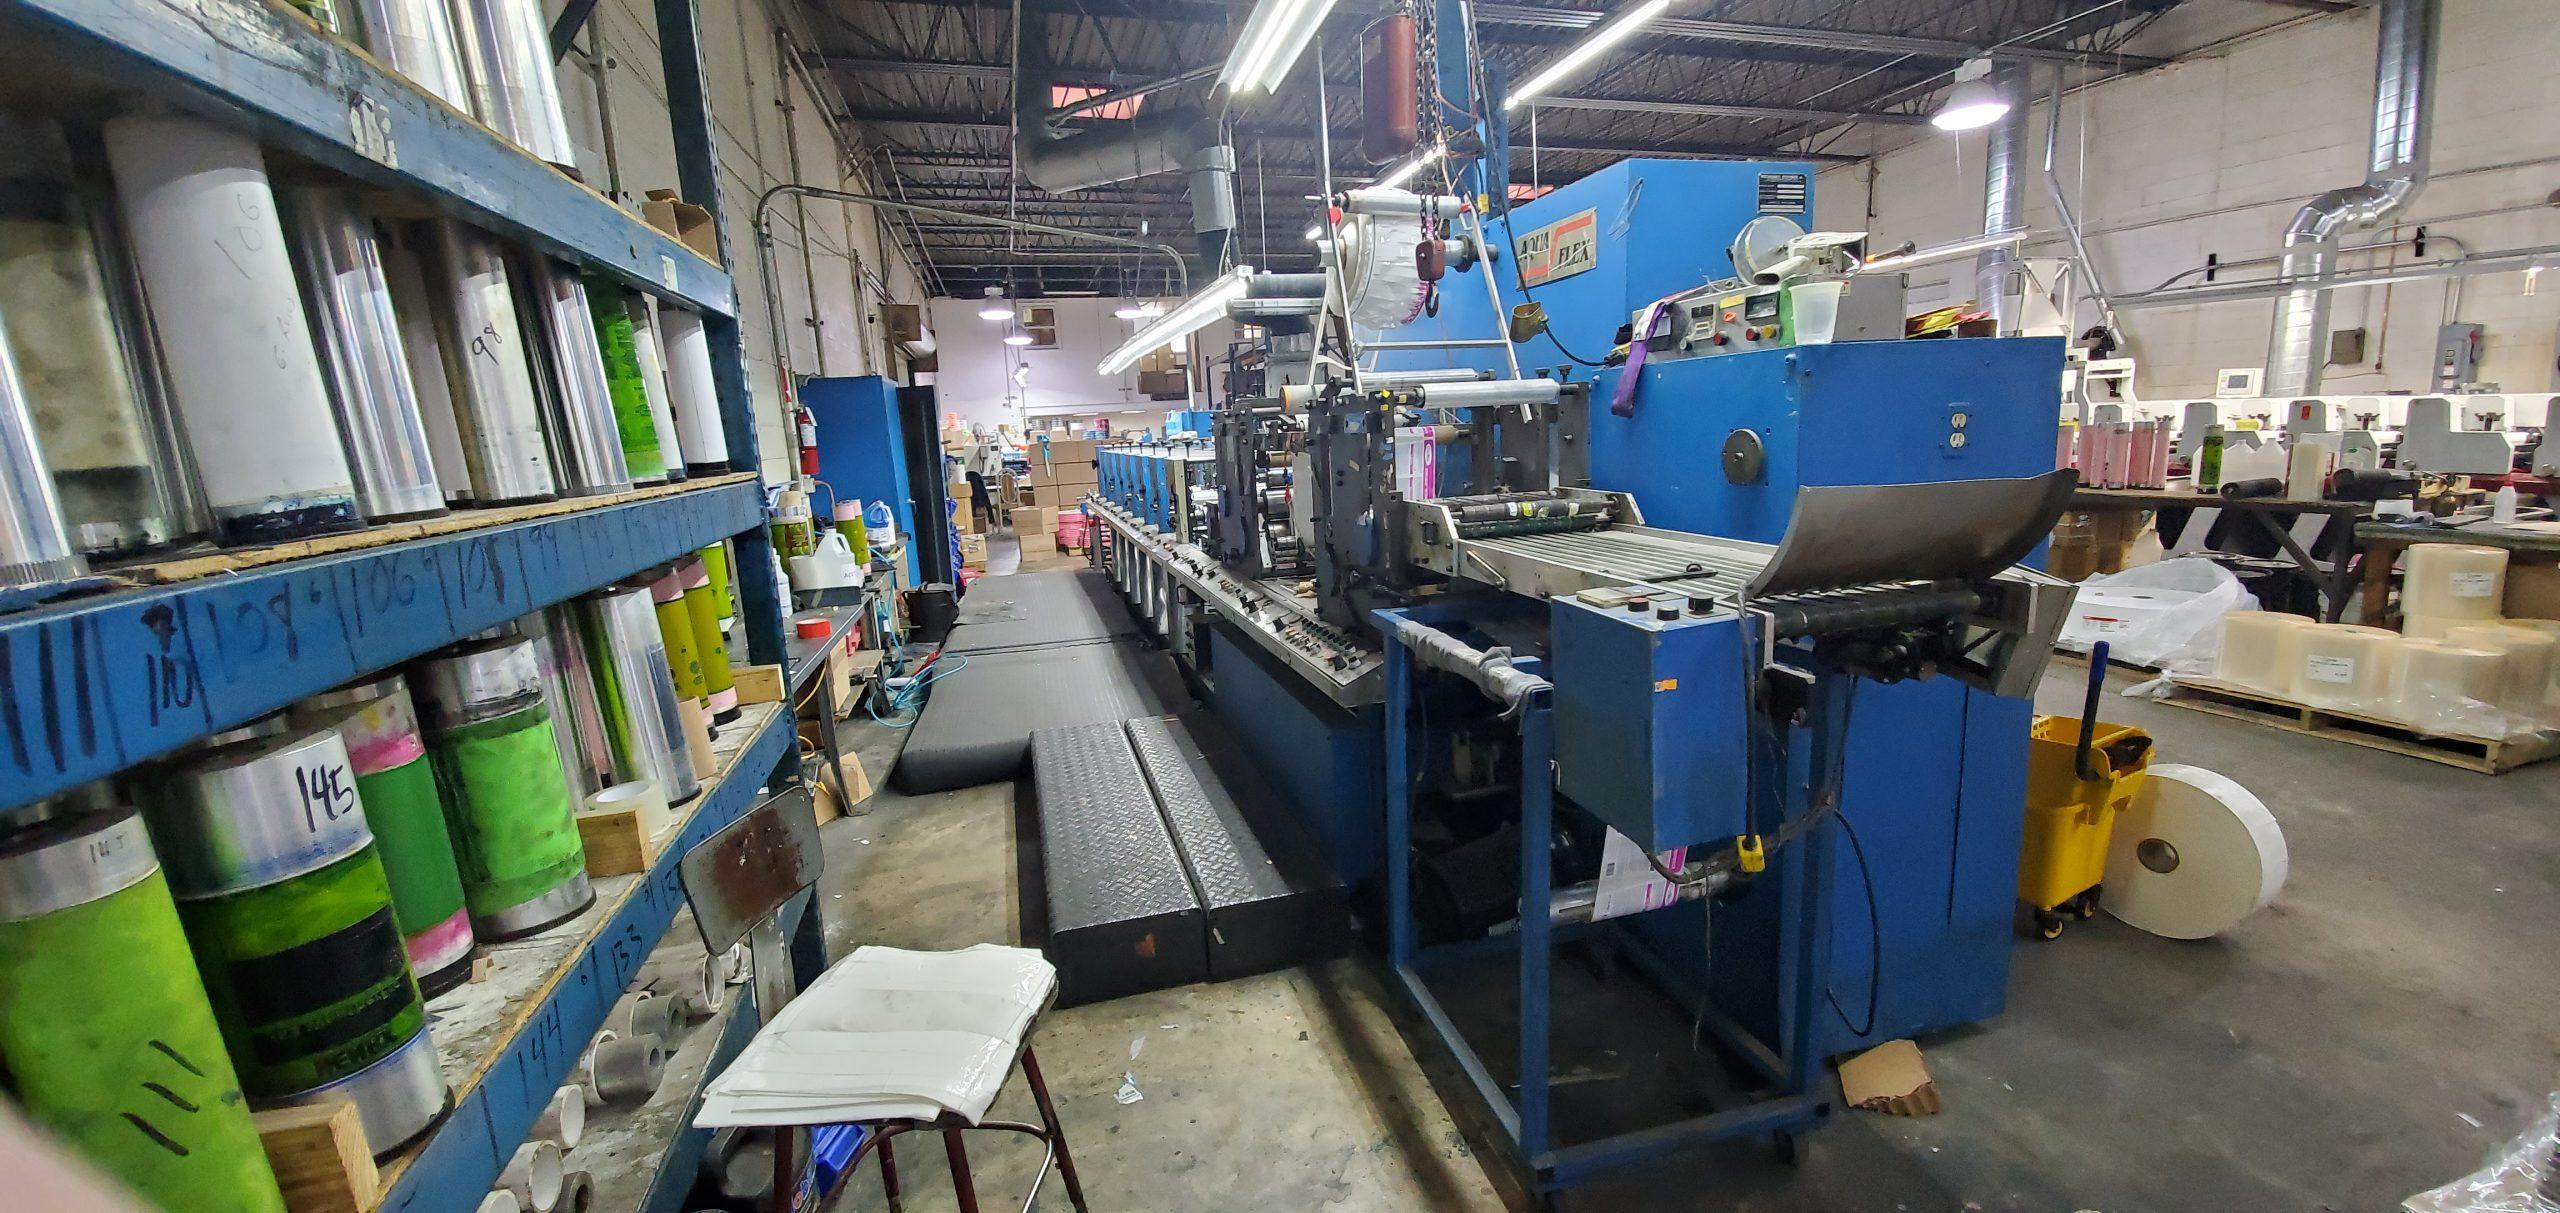 Aquaflex LWSP-1307 - Used Flexo Printing Presses and Used Flexographic Equipment-3